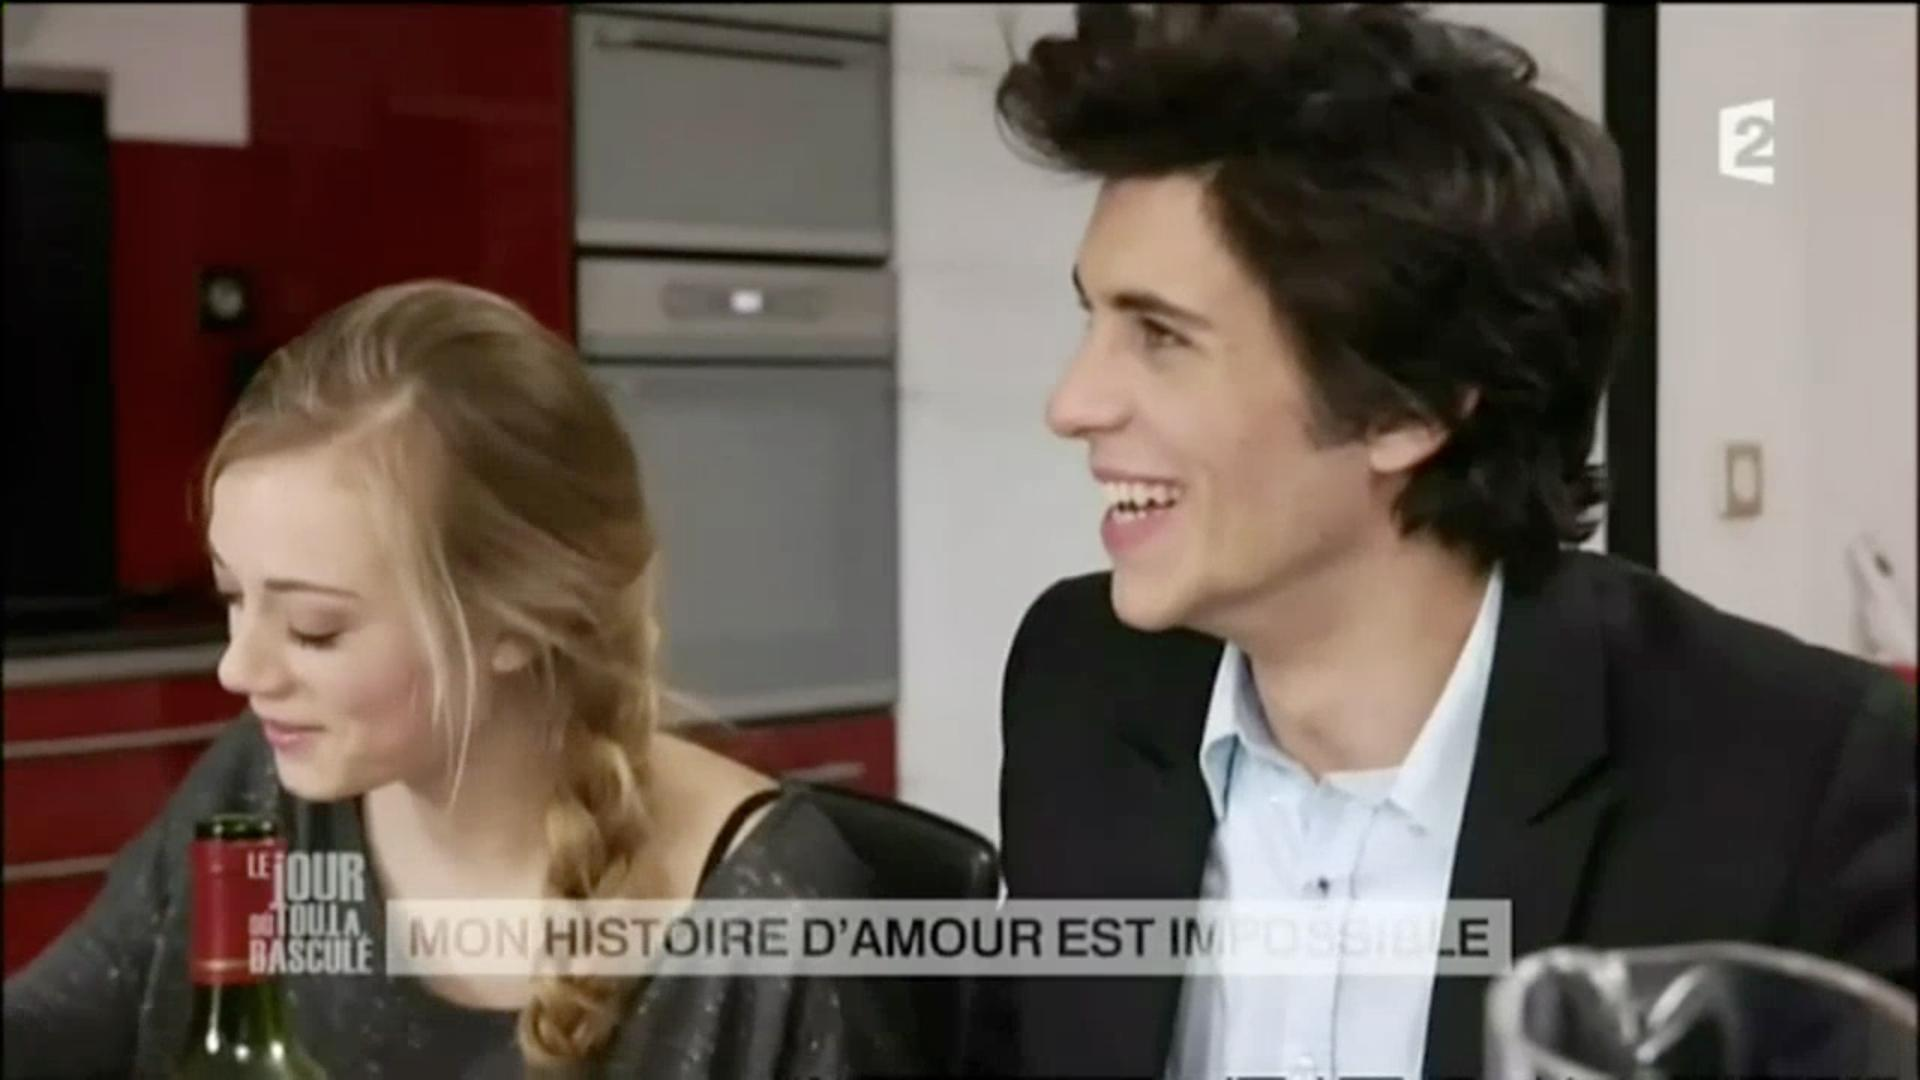 Maxence Kouzoubachian and Leïla Macaire in Le jour où tout a basculé (2011)